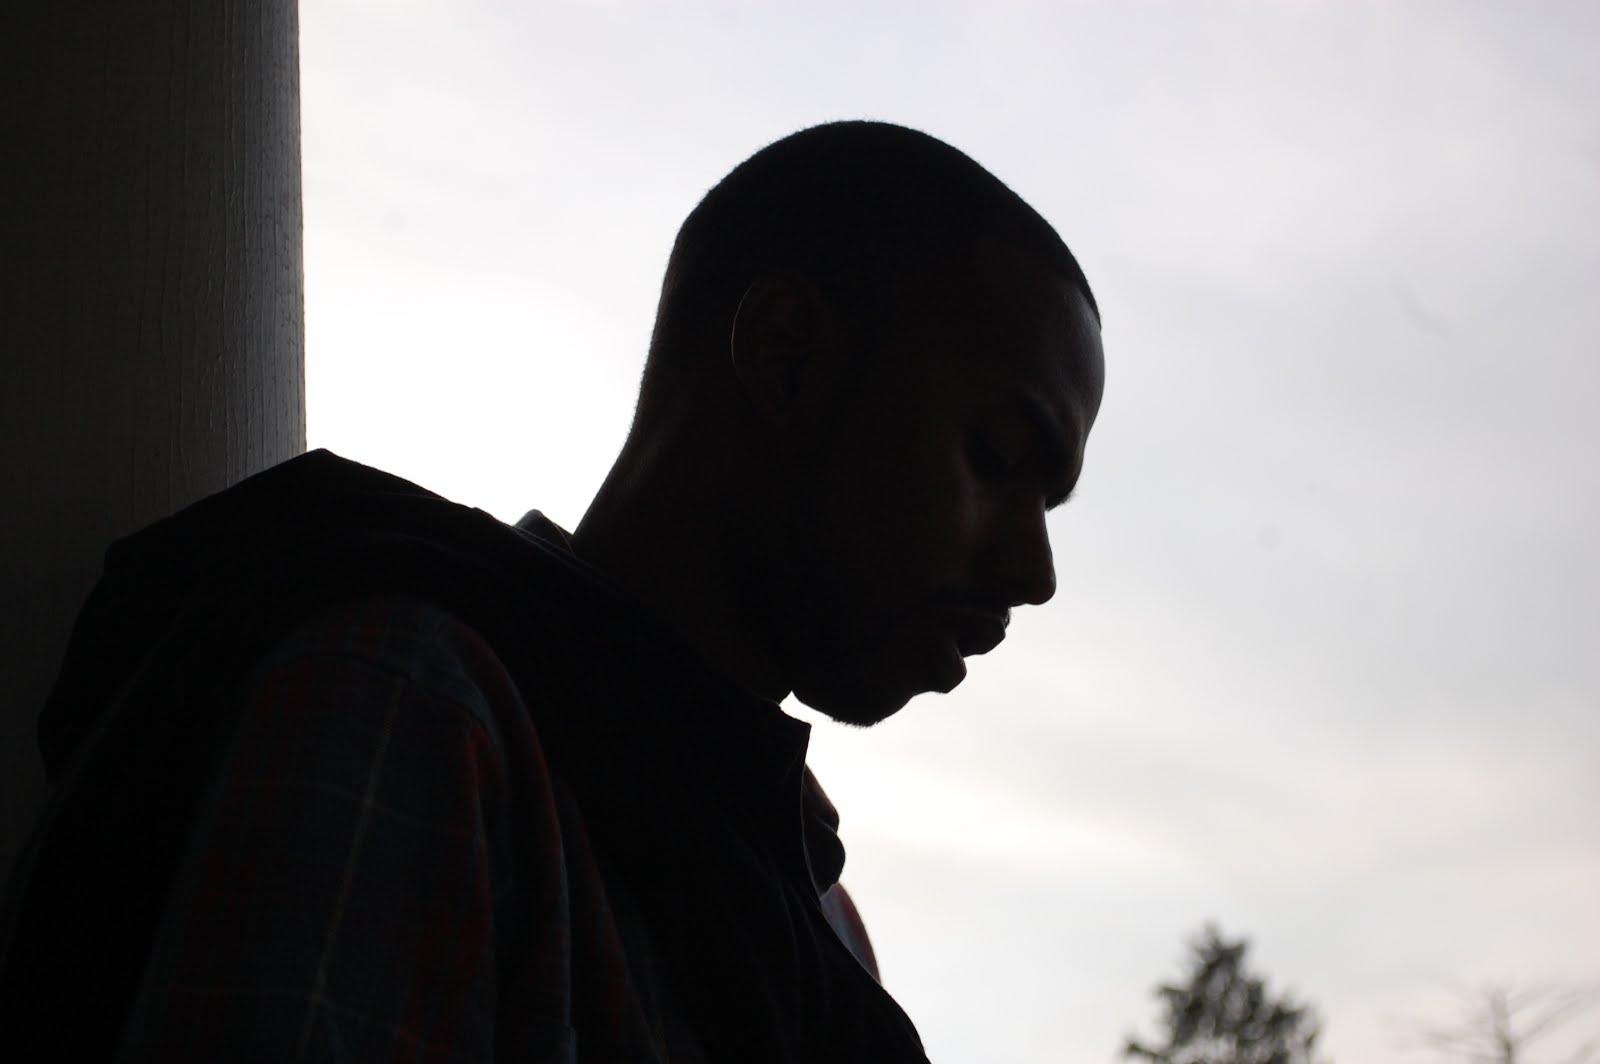 ELLIS, Original Manz, racism, classism, Mike Brown, justice